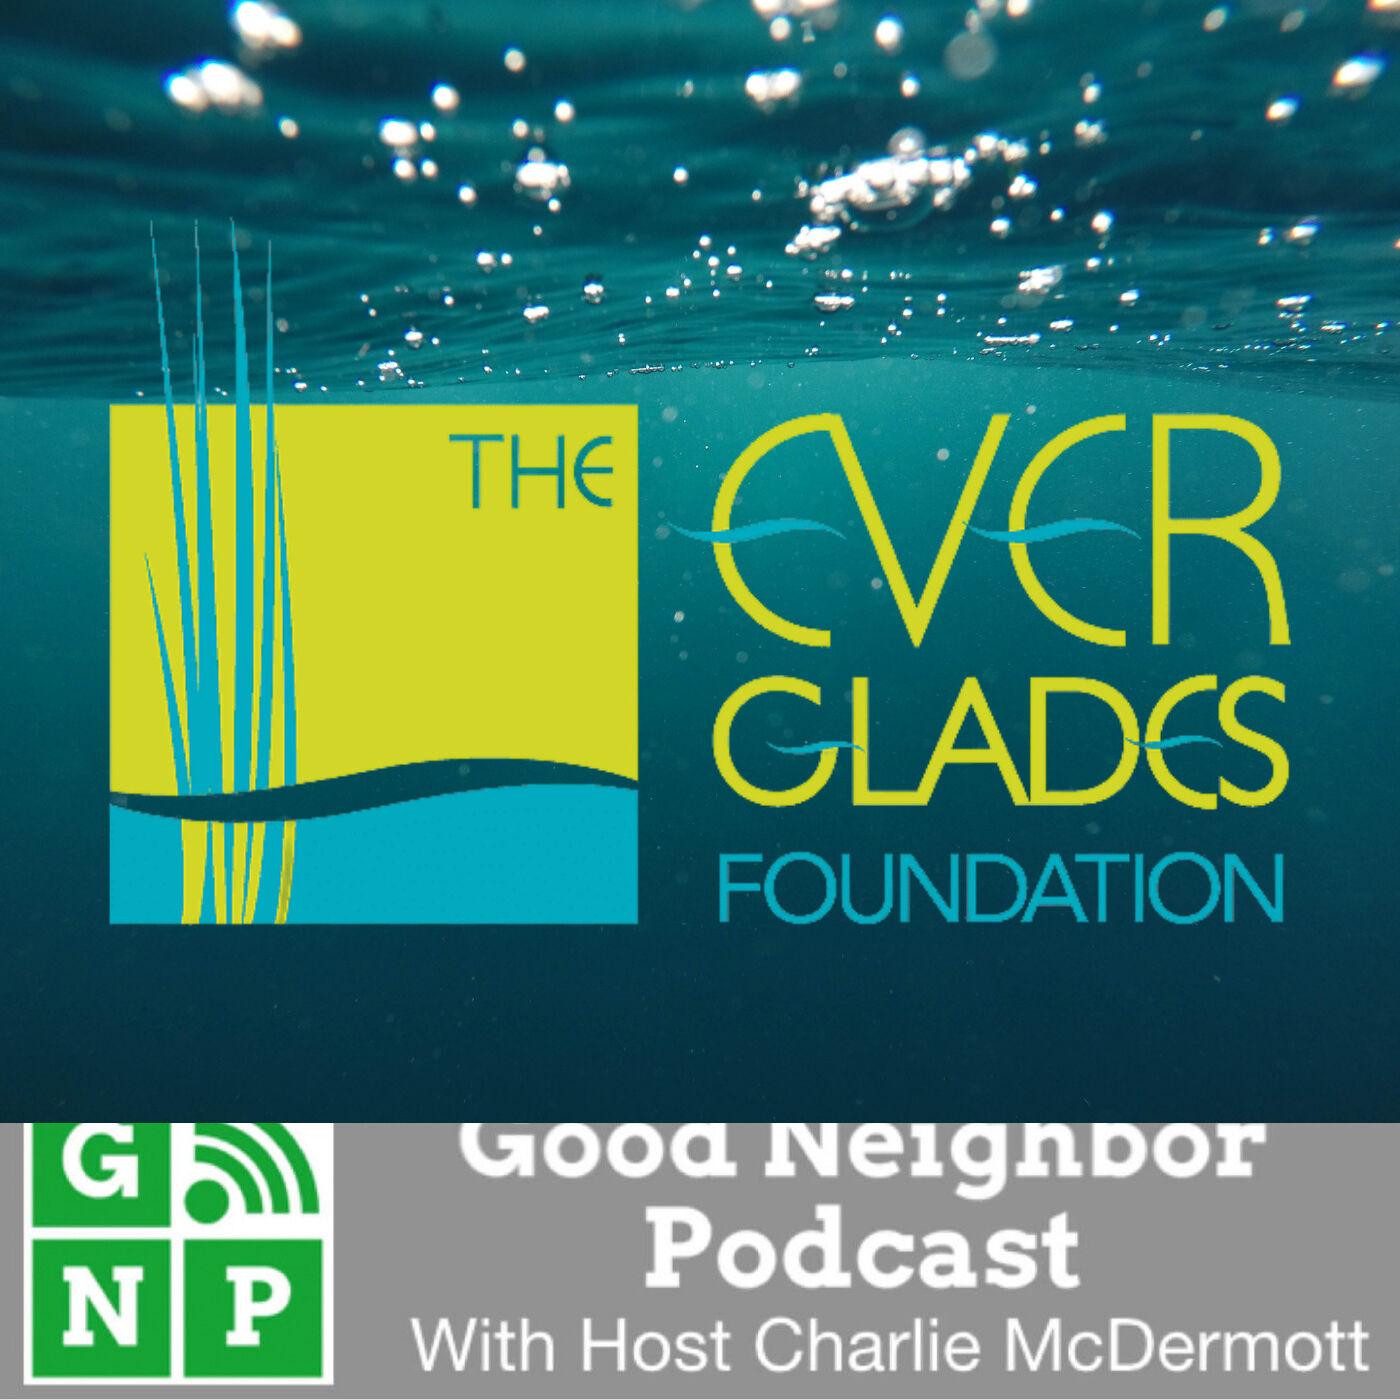 EP #536: Everglades Foundation with Eric Eikenberg